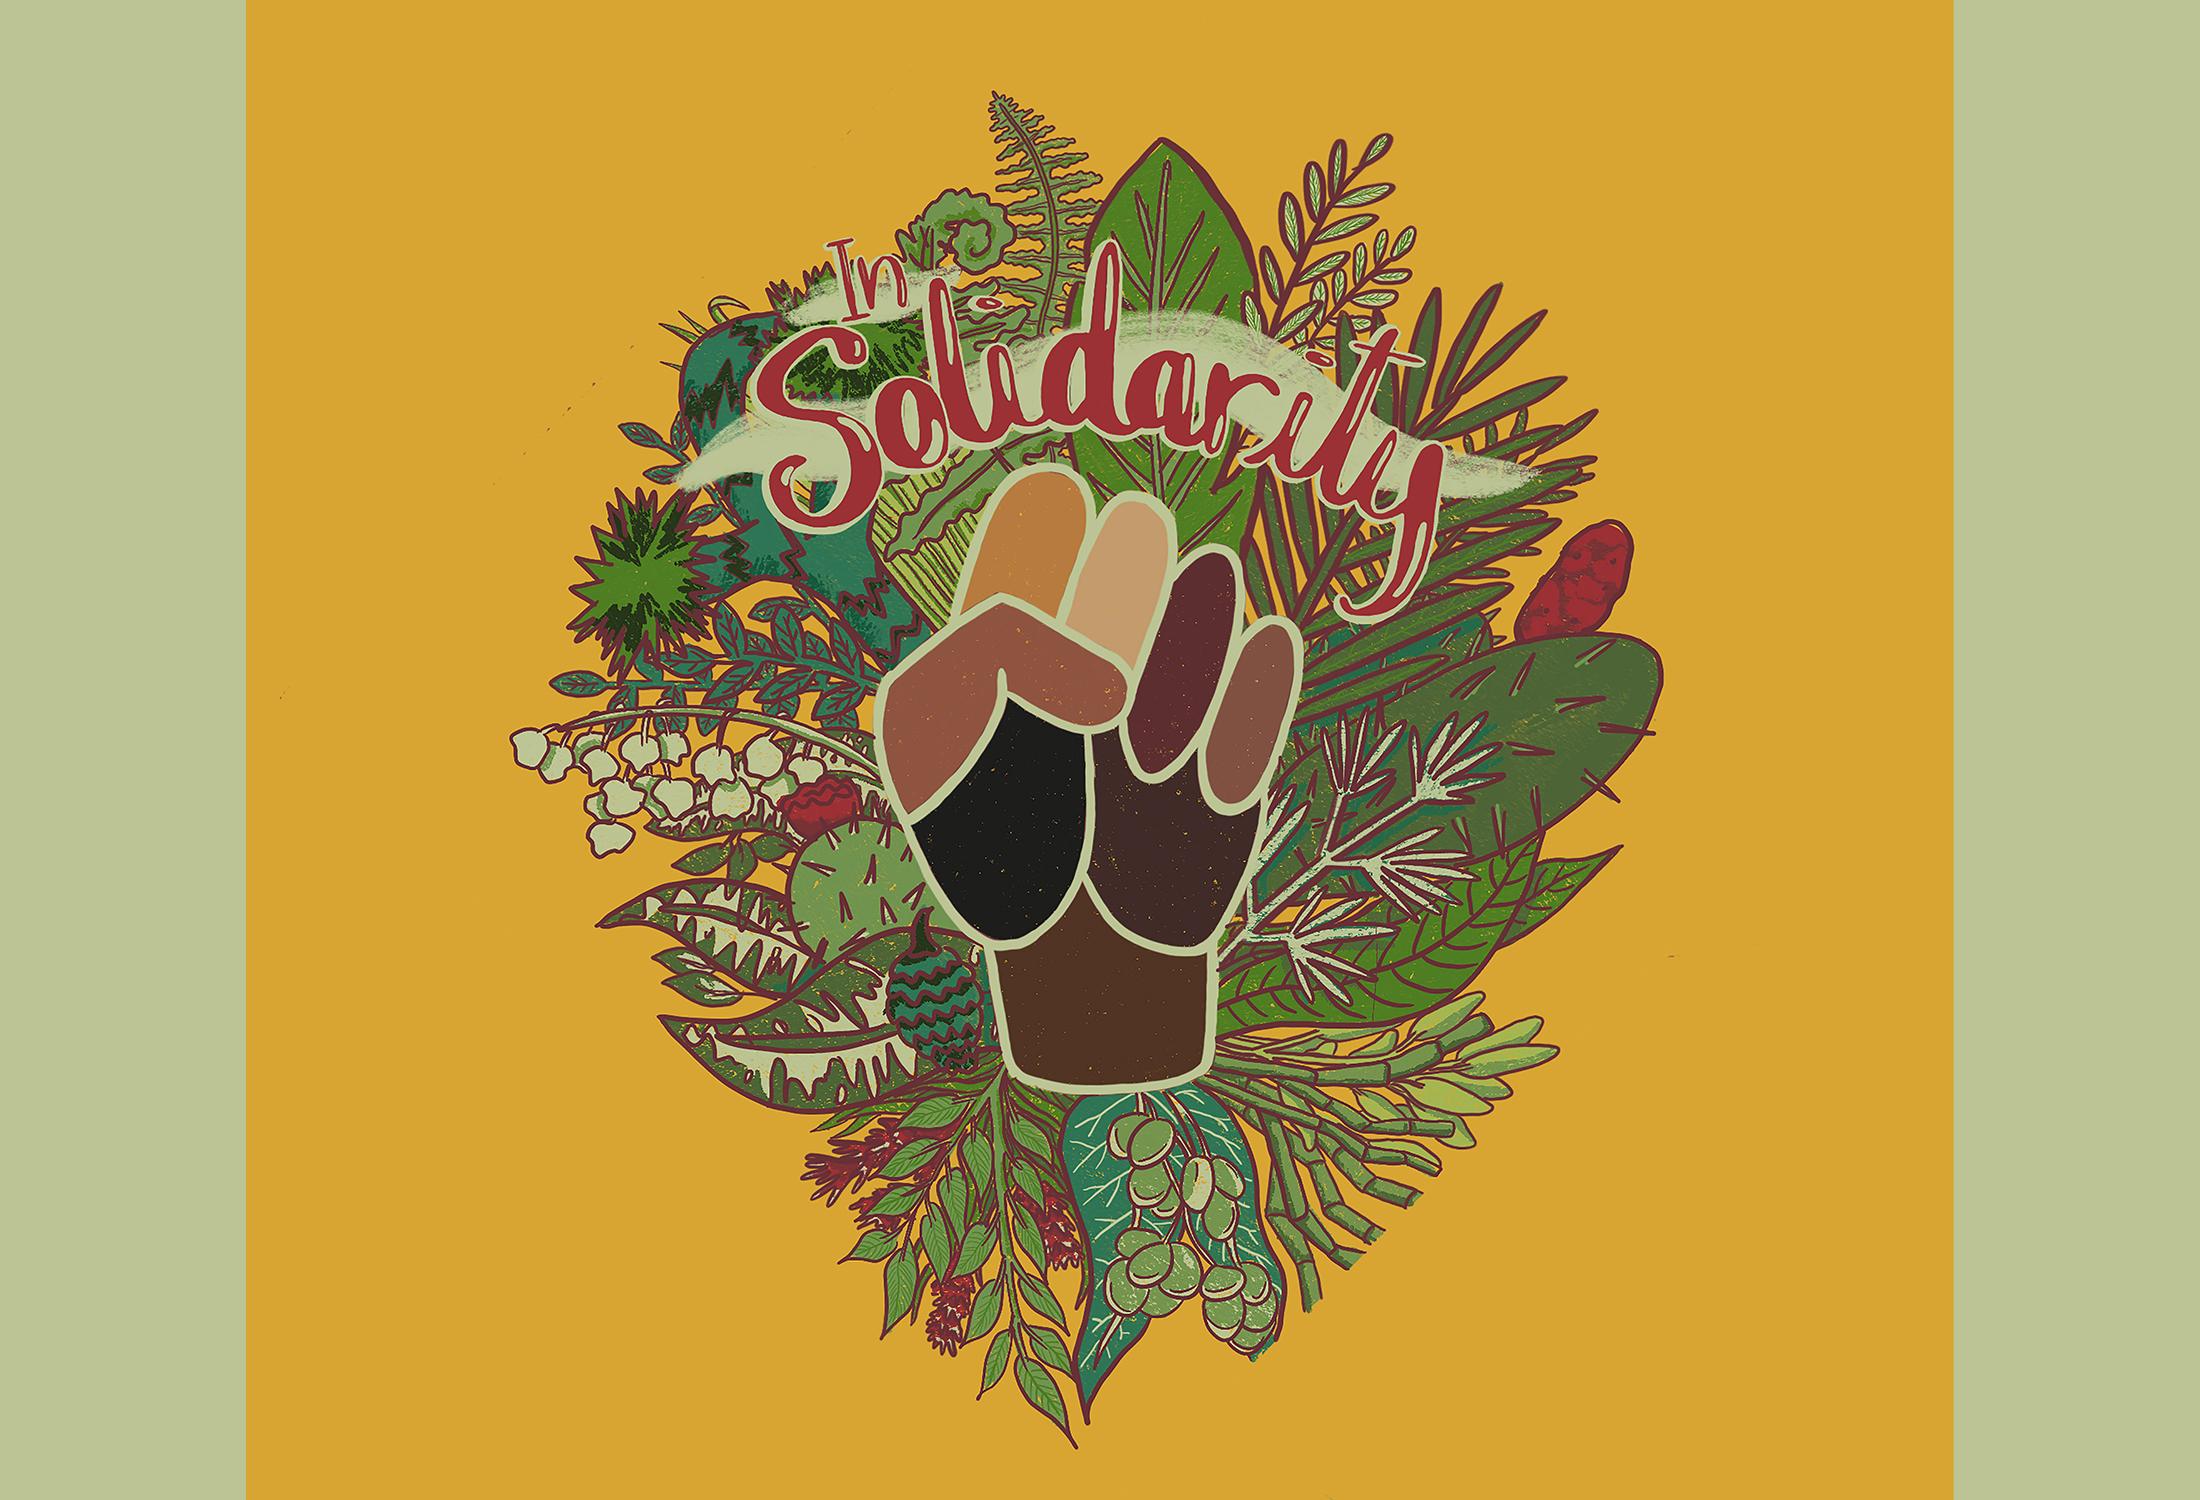 In Solidarity collaboration Kula Cloth design by Latasha Dunston